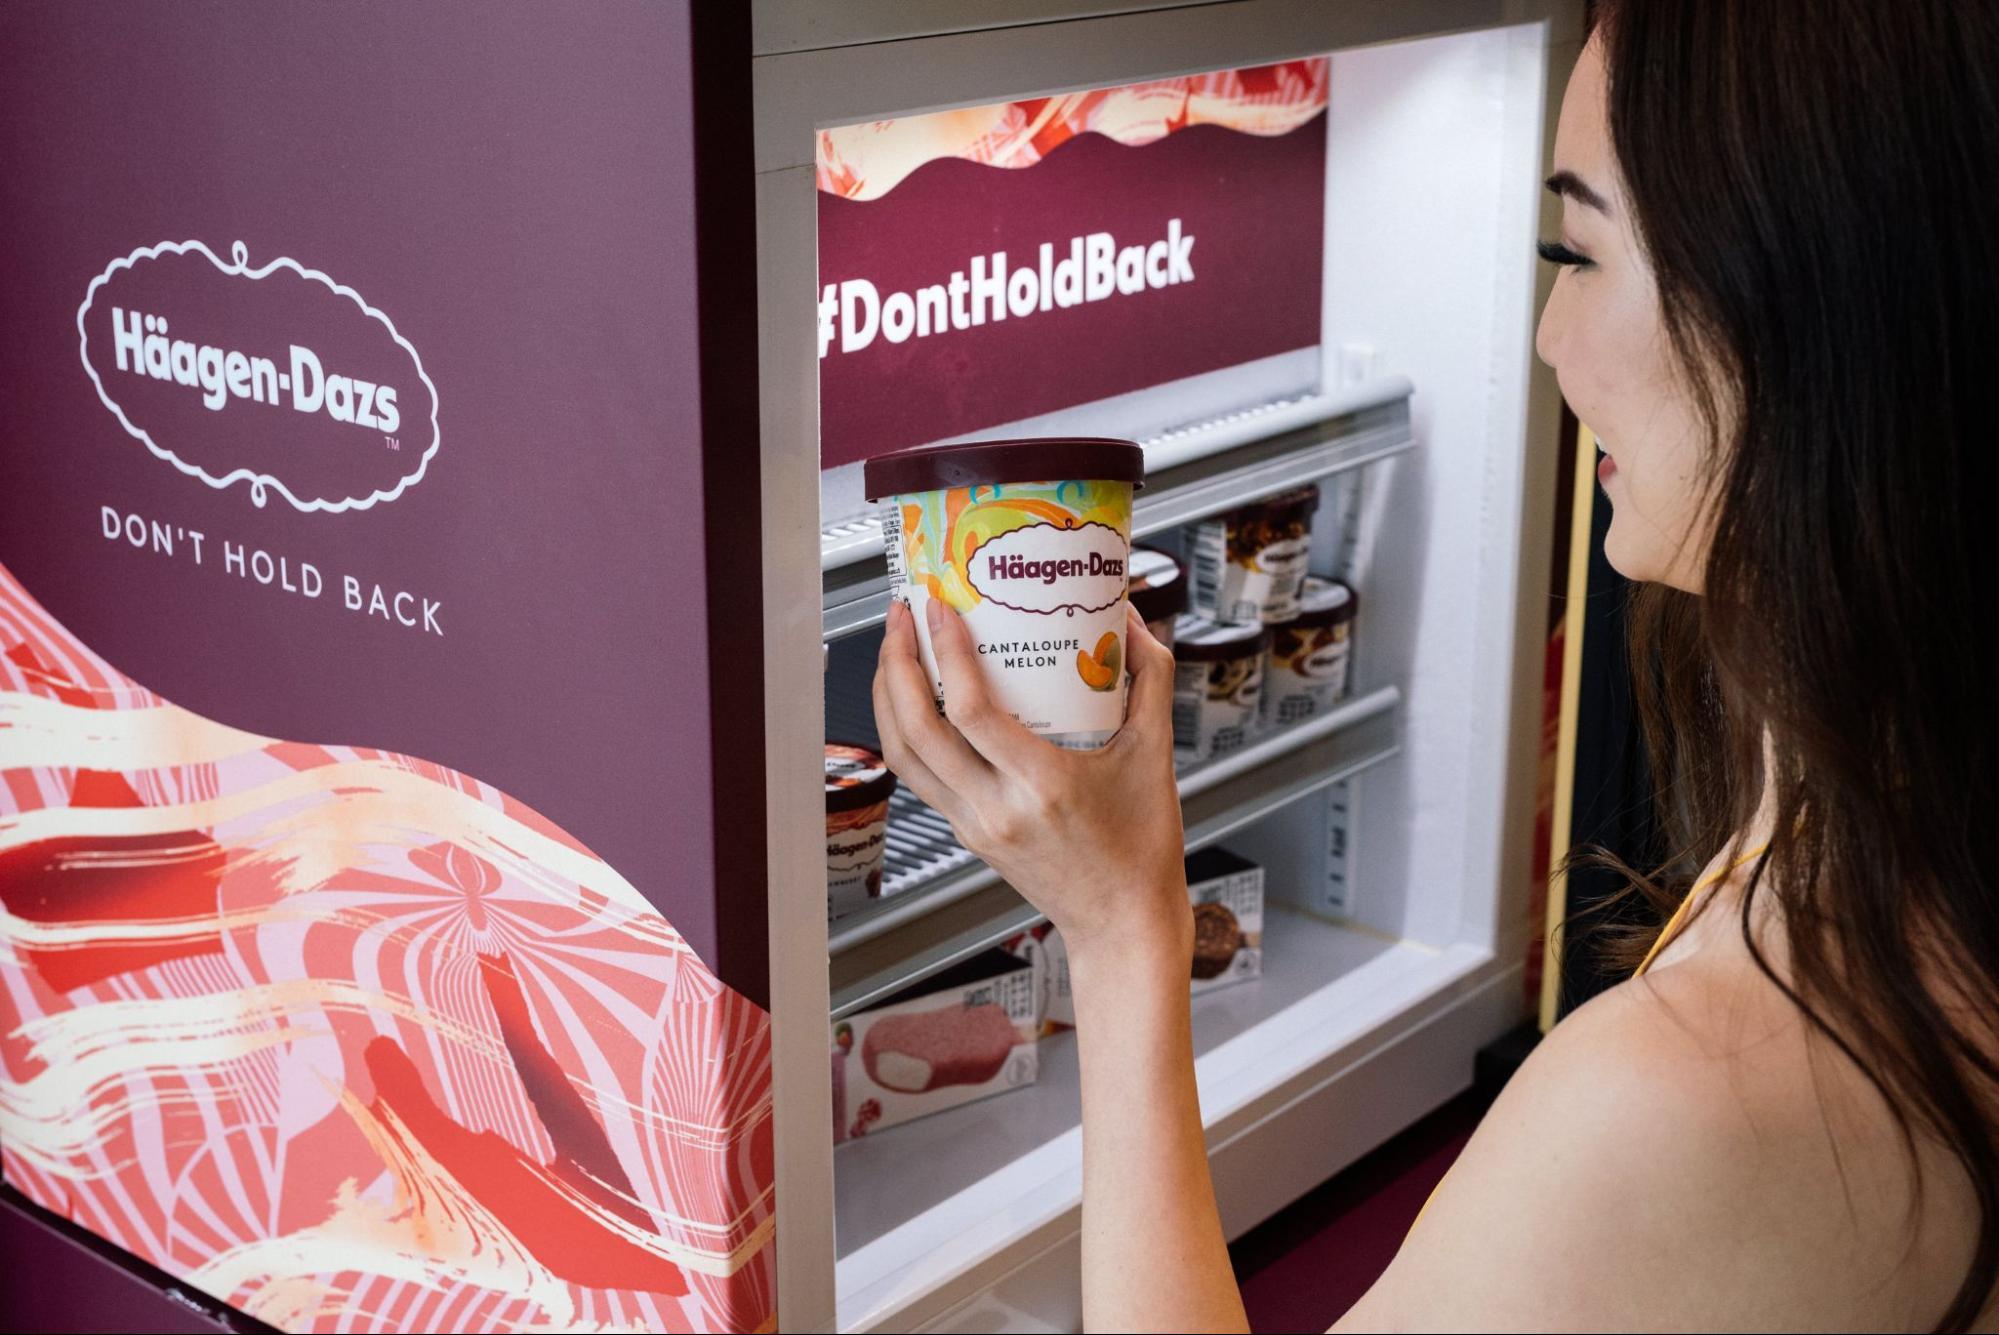 haagen dazs staycation - Shangri-La Singapore - fridge